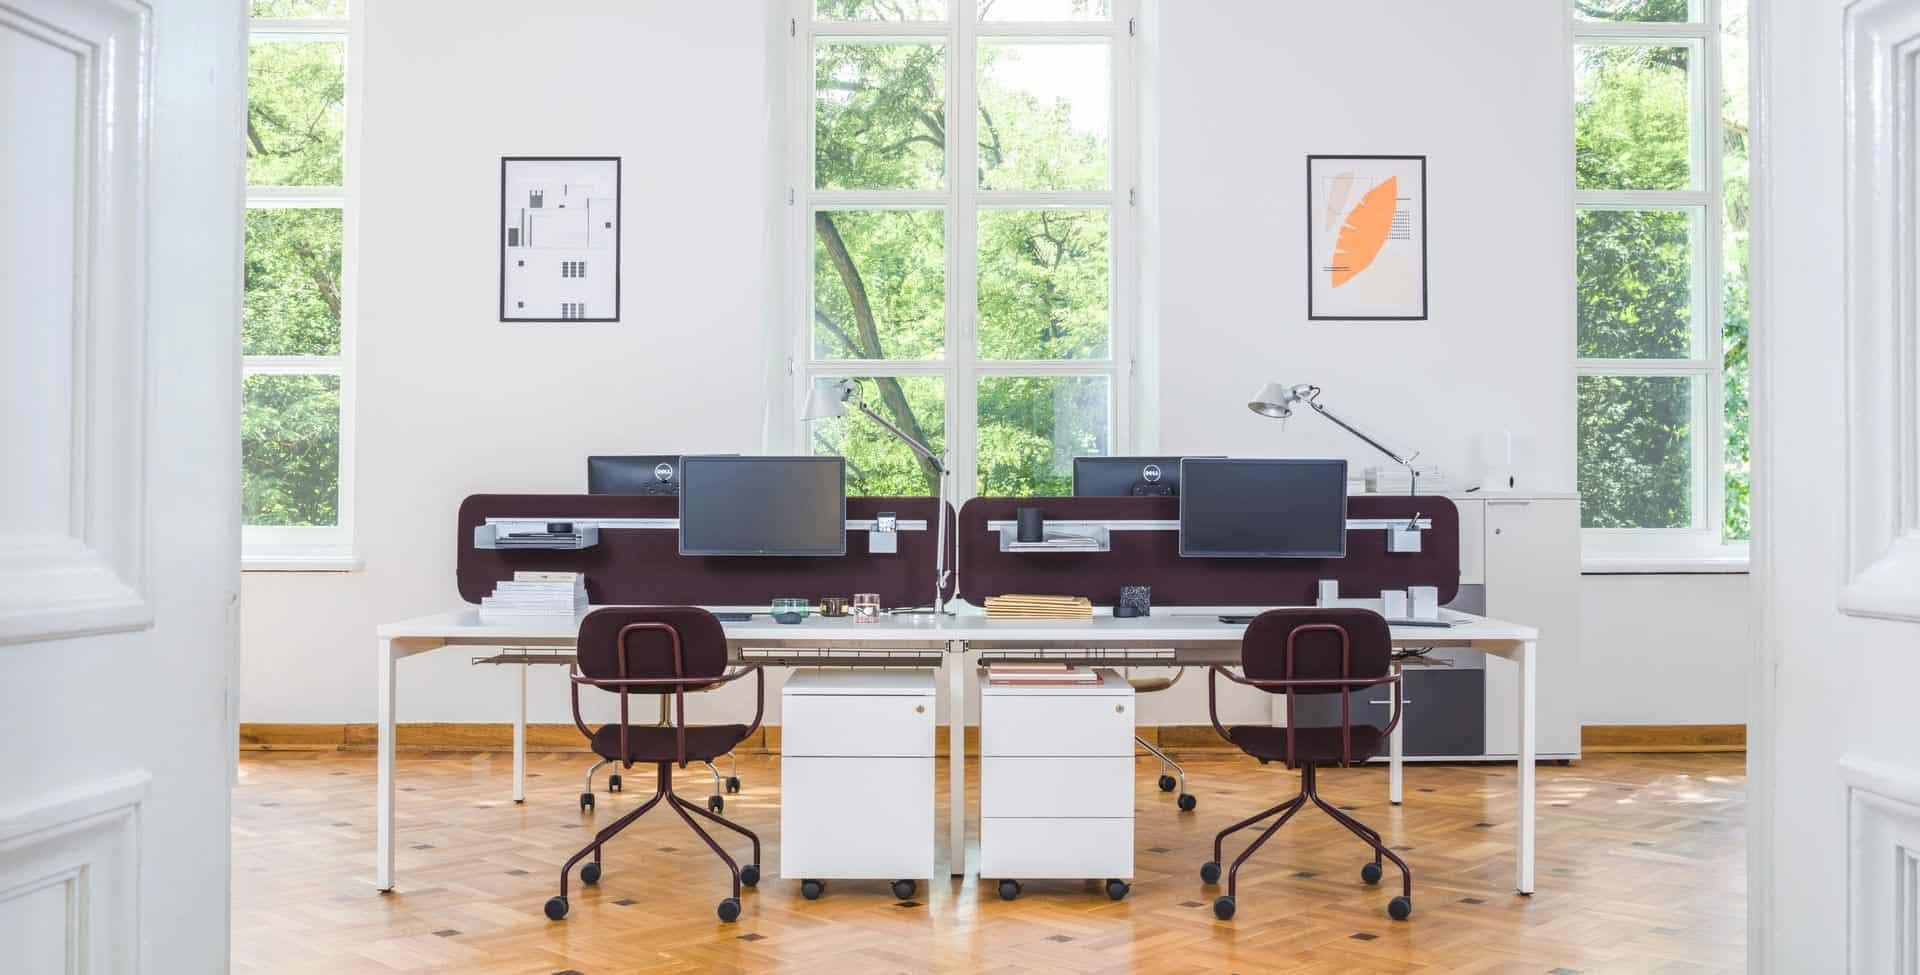 mobilier de bureau à Caen (Calvados -14) en Normandie - MDD Countertop Office Divider 13